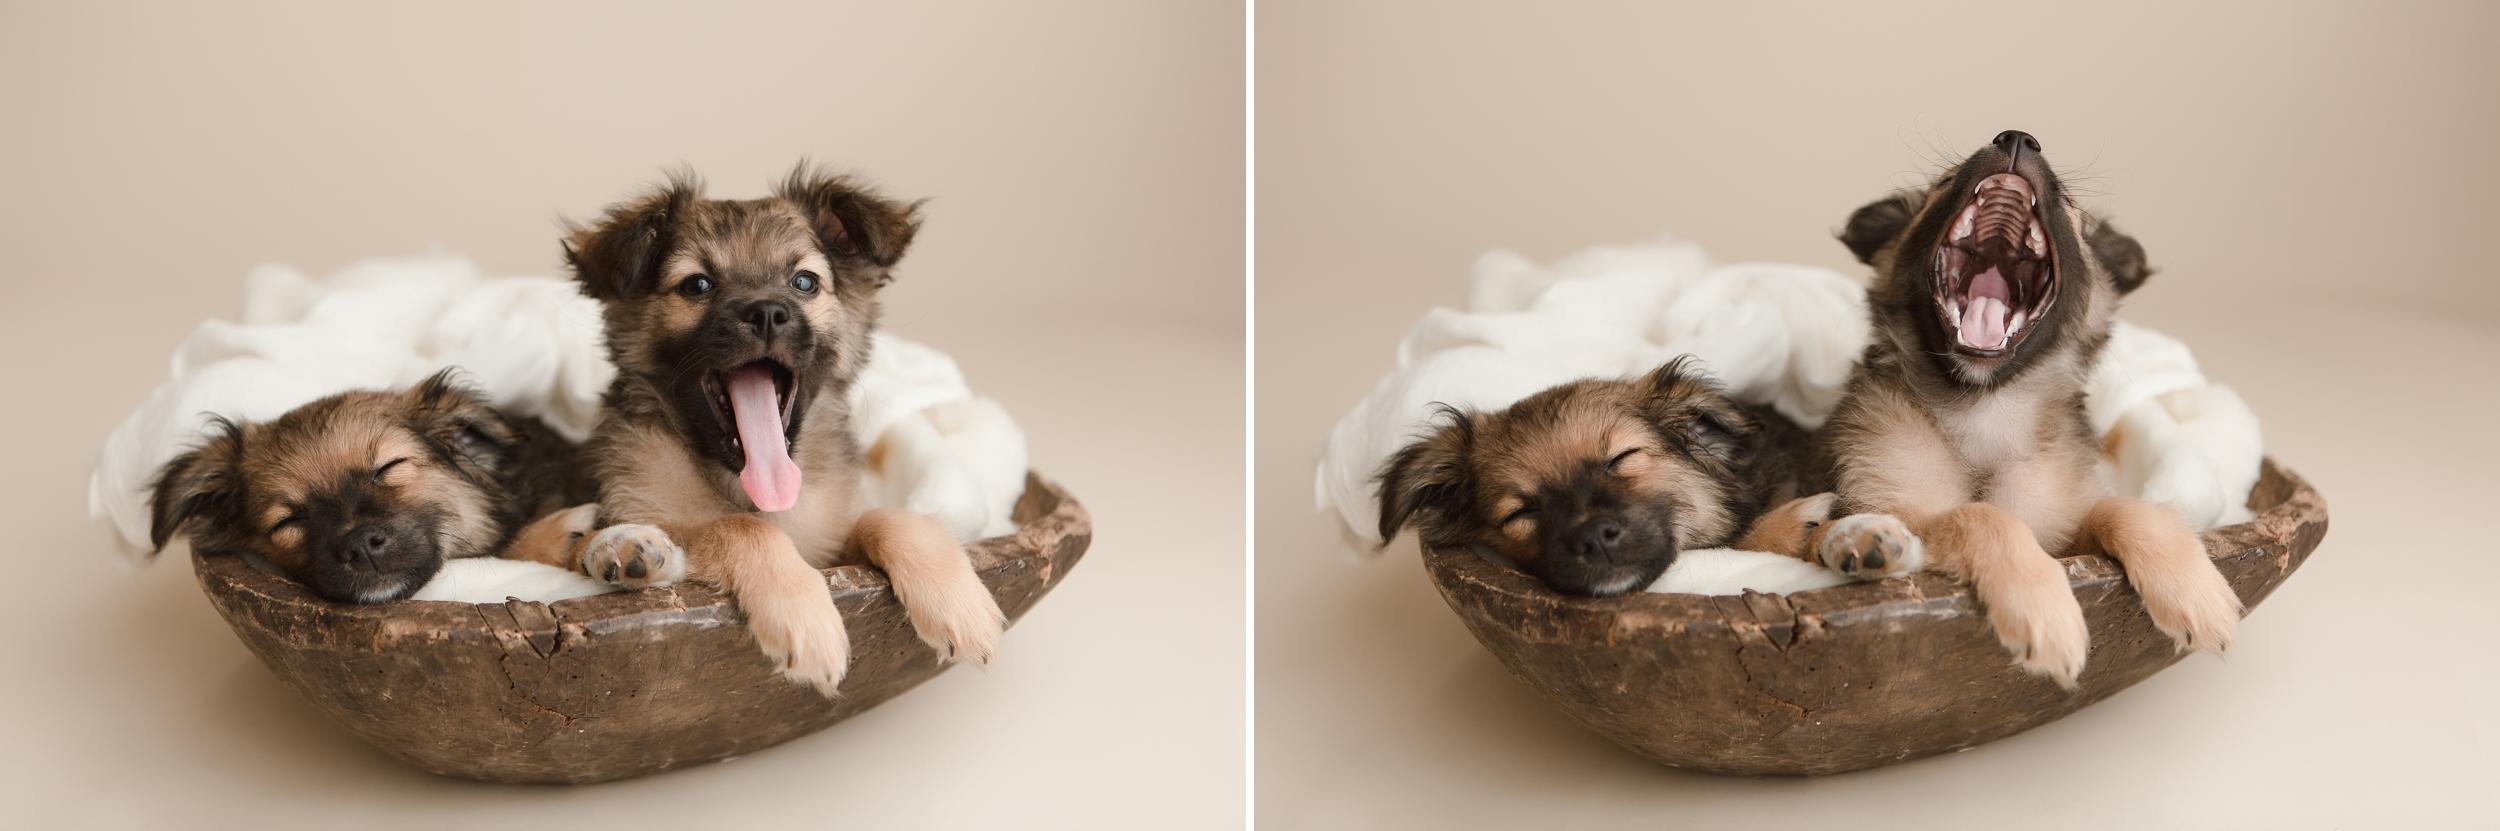 puppies 12.jpg